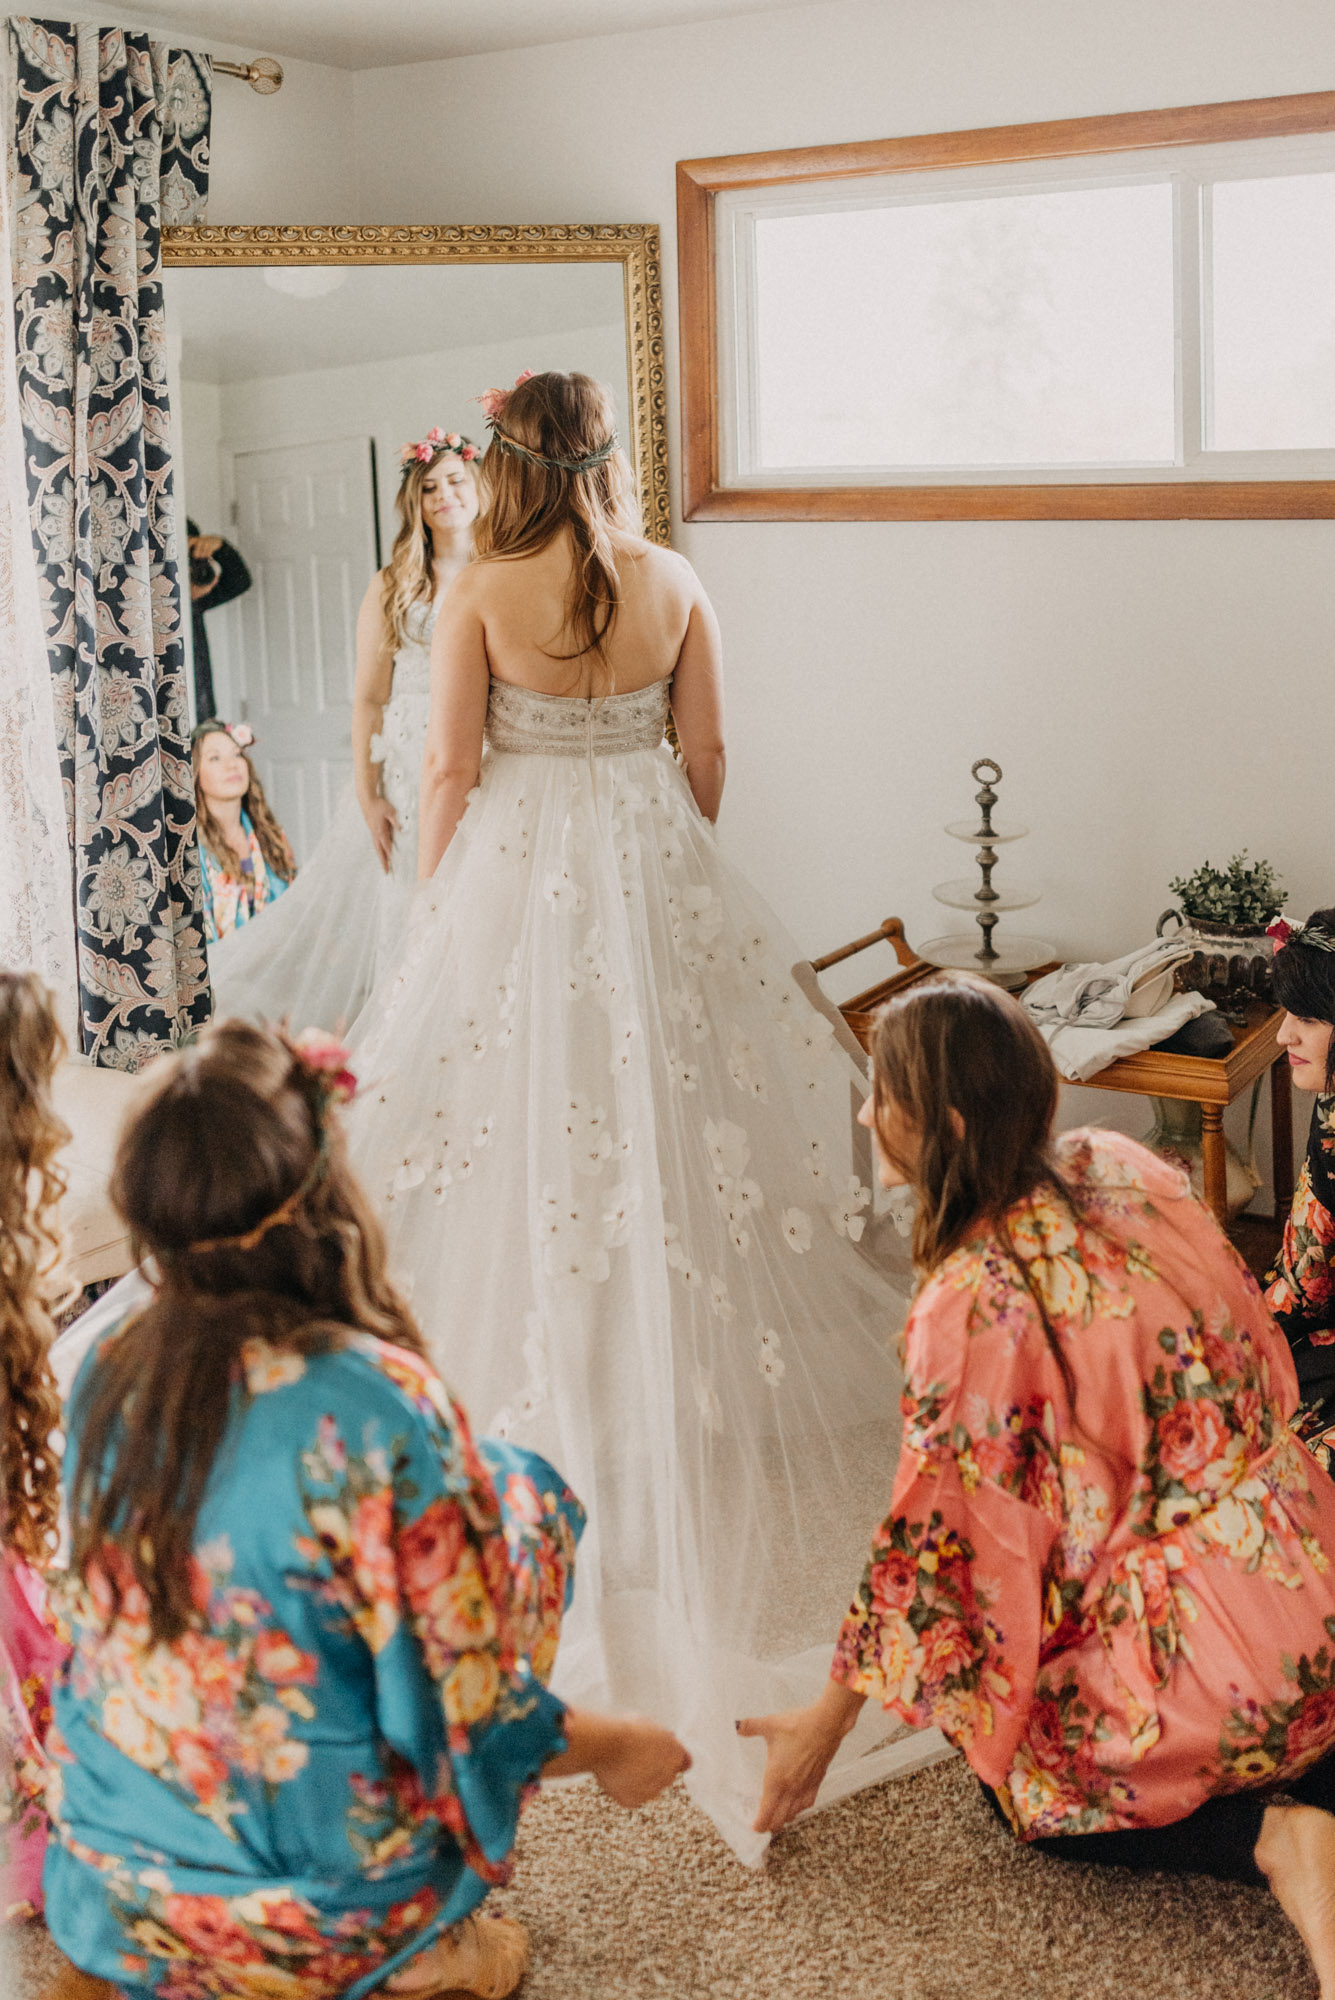 Getting-Ready-Swingset-Washington-Wedding-ringshot-8034.jpg